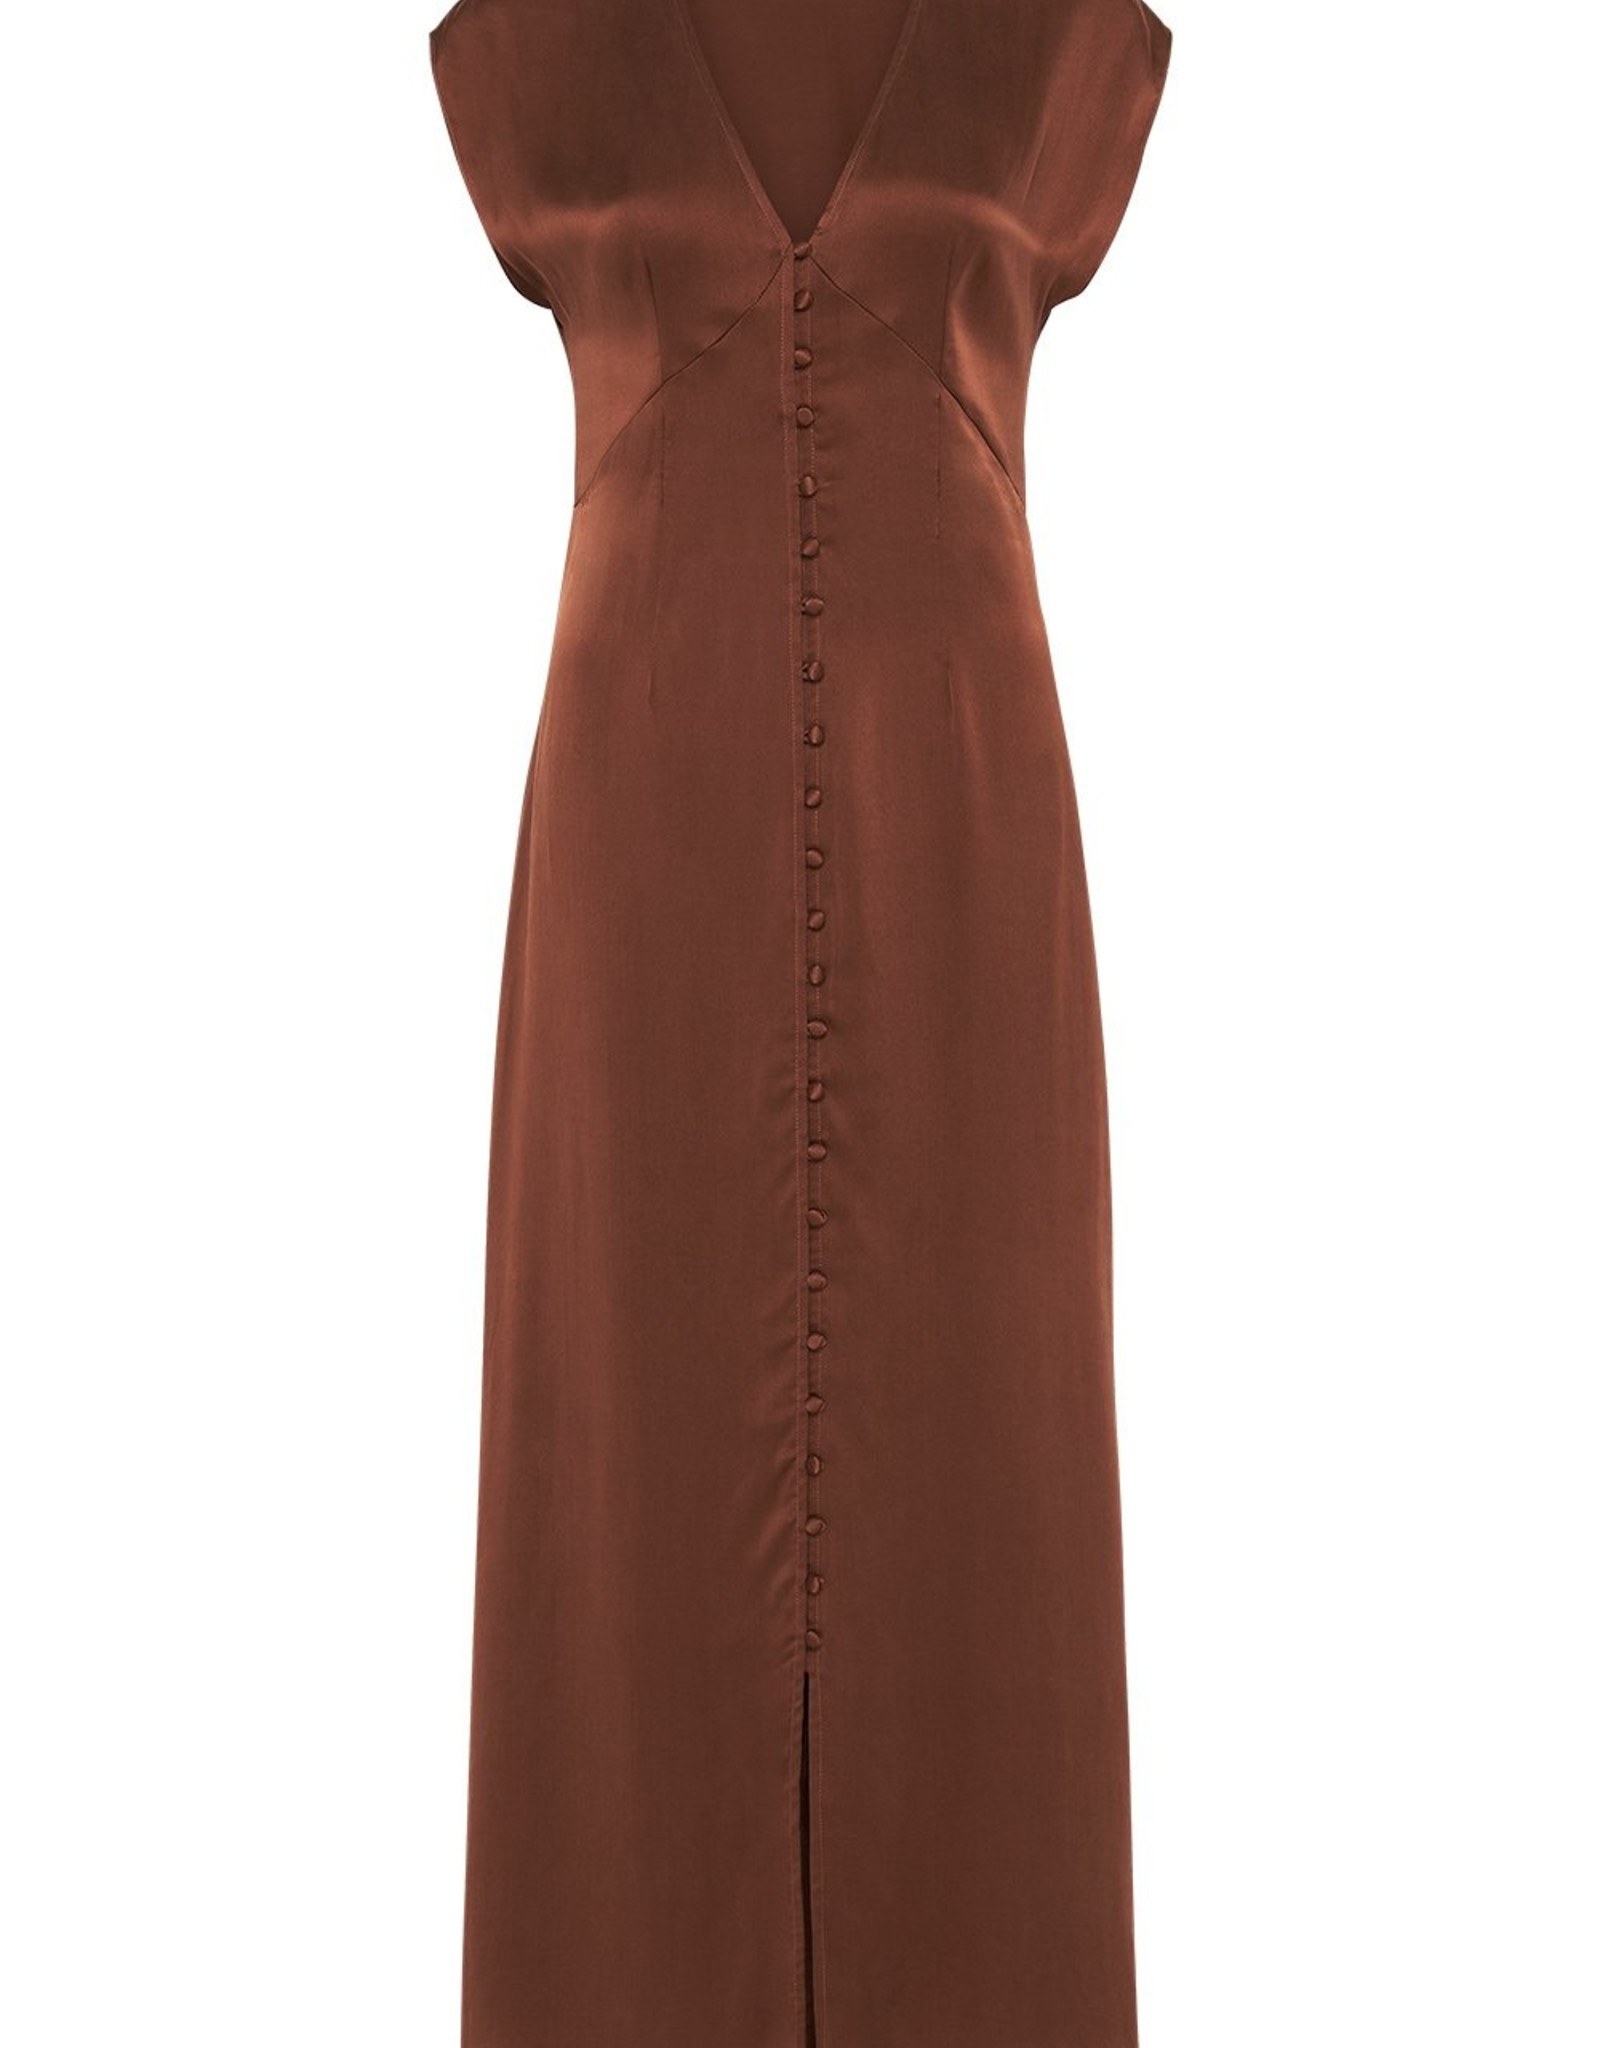 SILK LAUNDRY V NECK DRESS CHOCOLATE